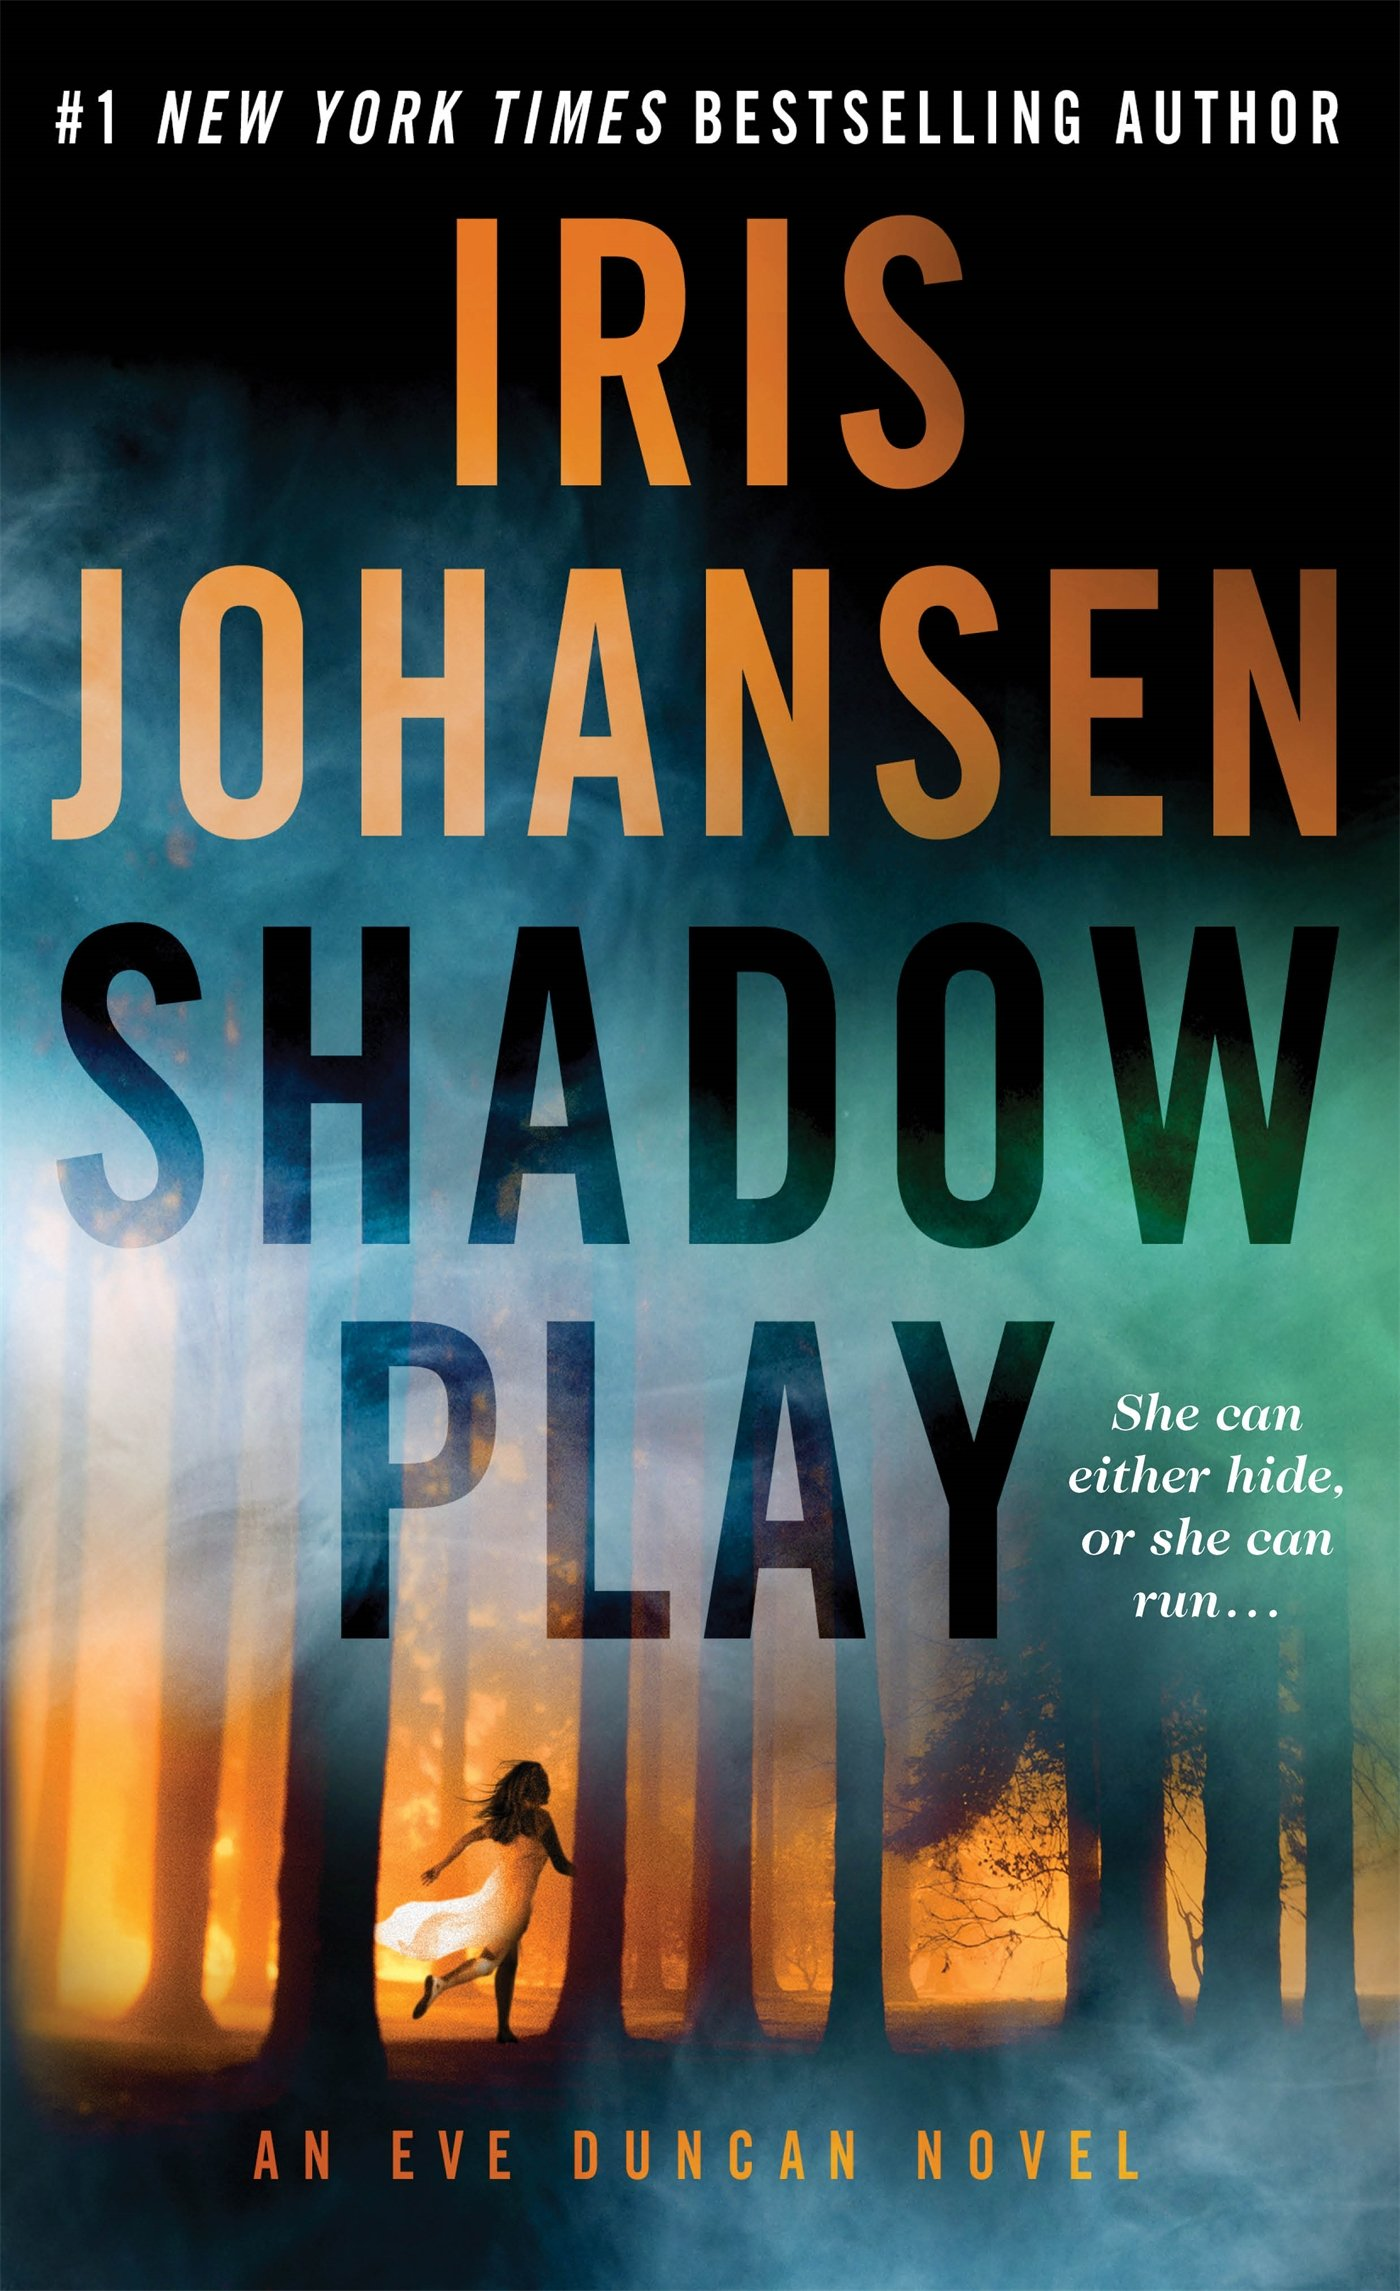 Amazon.com: Shadow Play: An Eve Duncan Novel (9781250075819): Iris  Johansen: Books